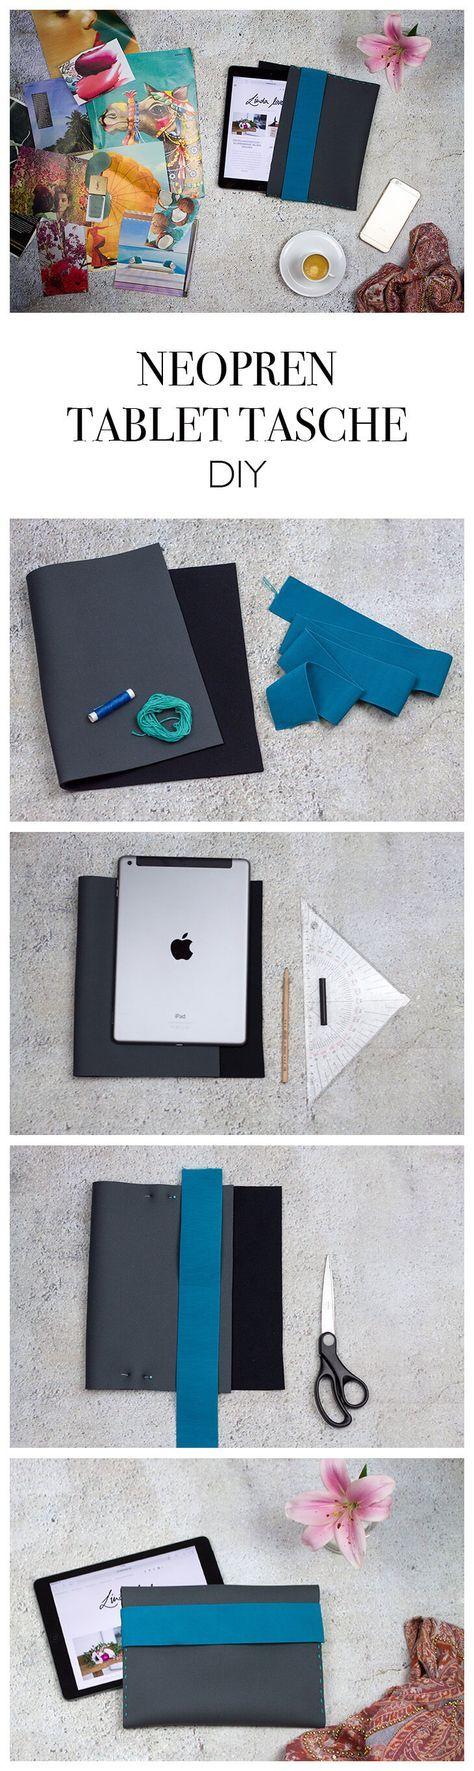 DIY Neopren Tablet Tasche nähen mit Gummiband - Geschenkidee - Step-by-Step Anleitung - DIY Blog lindaloves.de